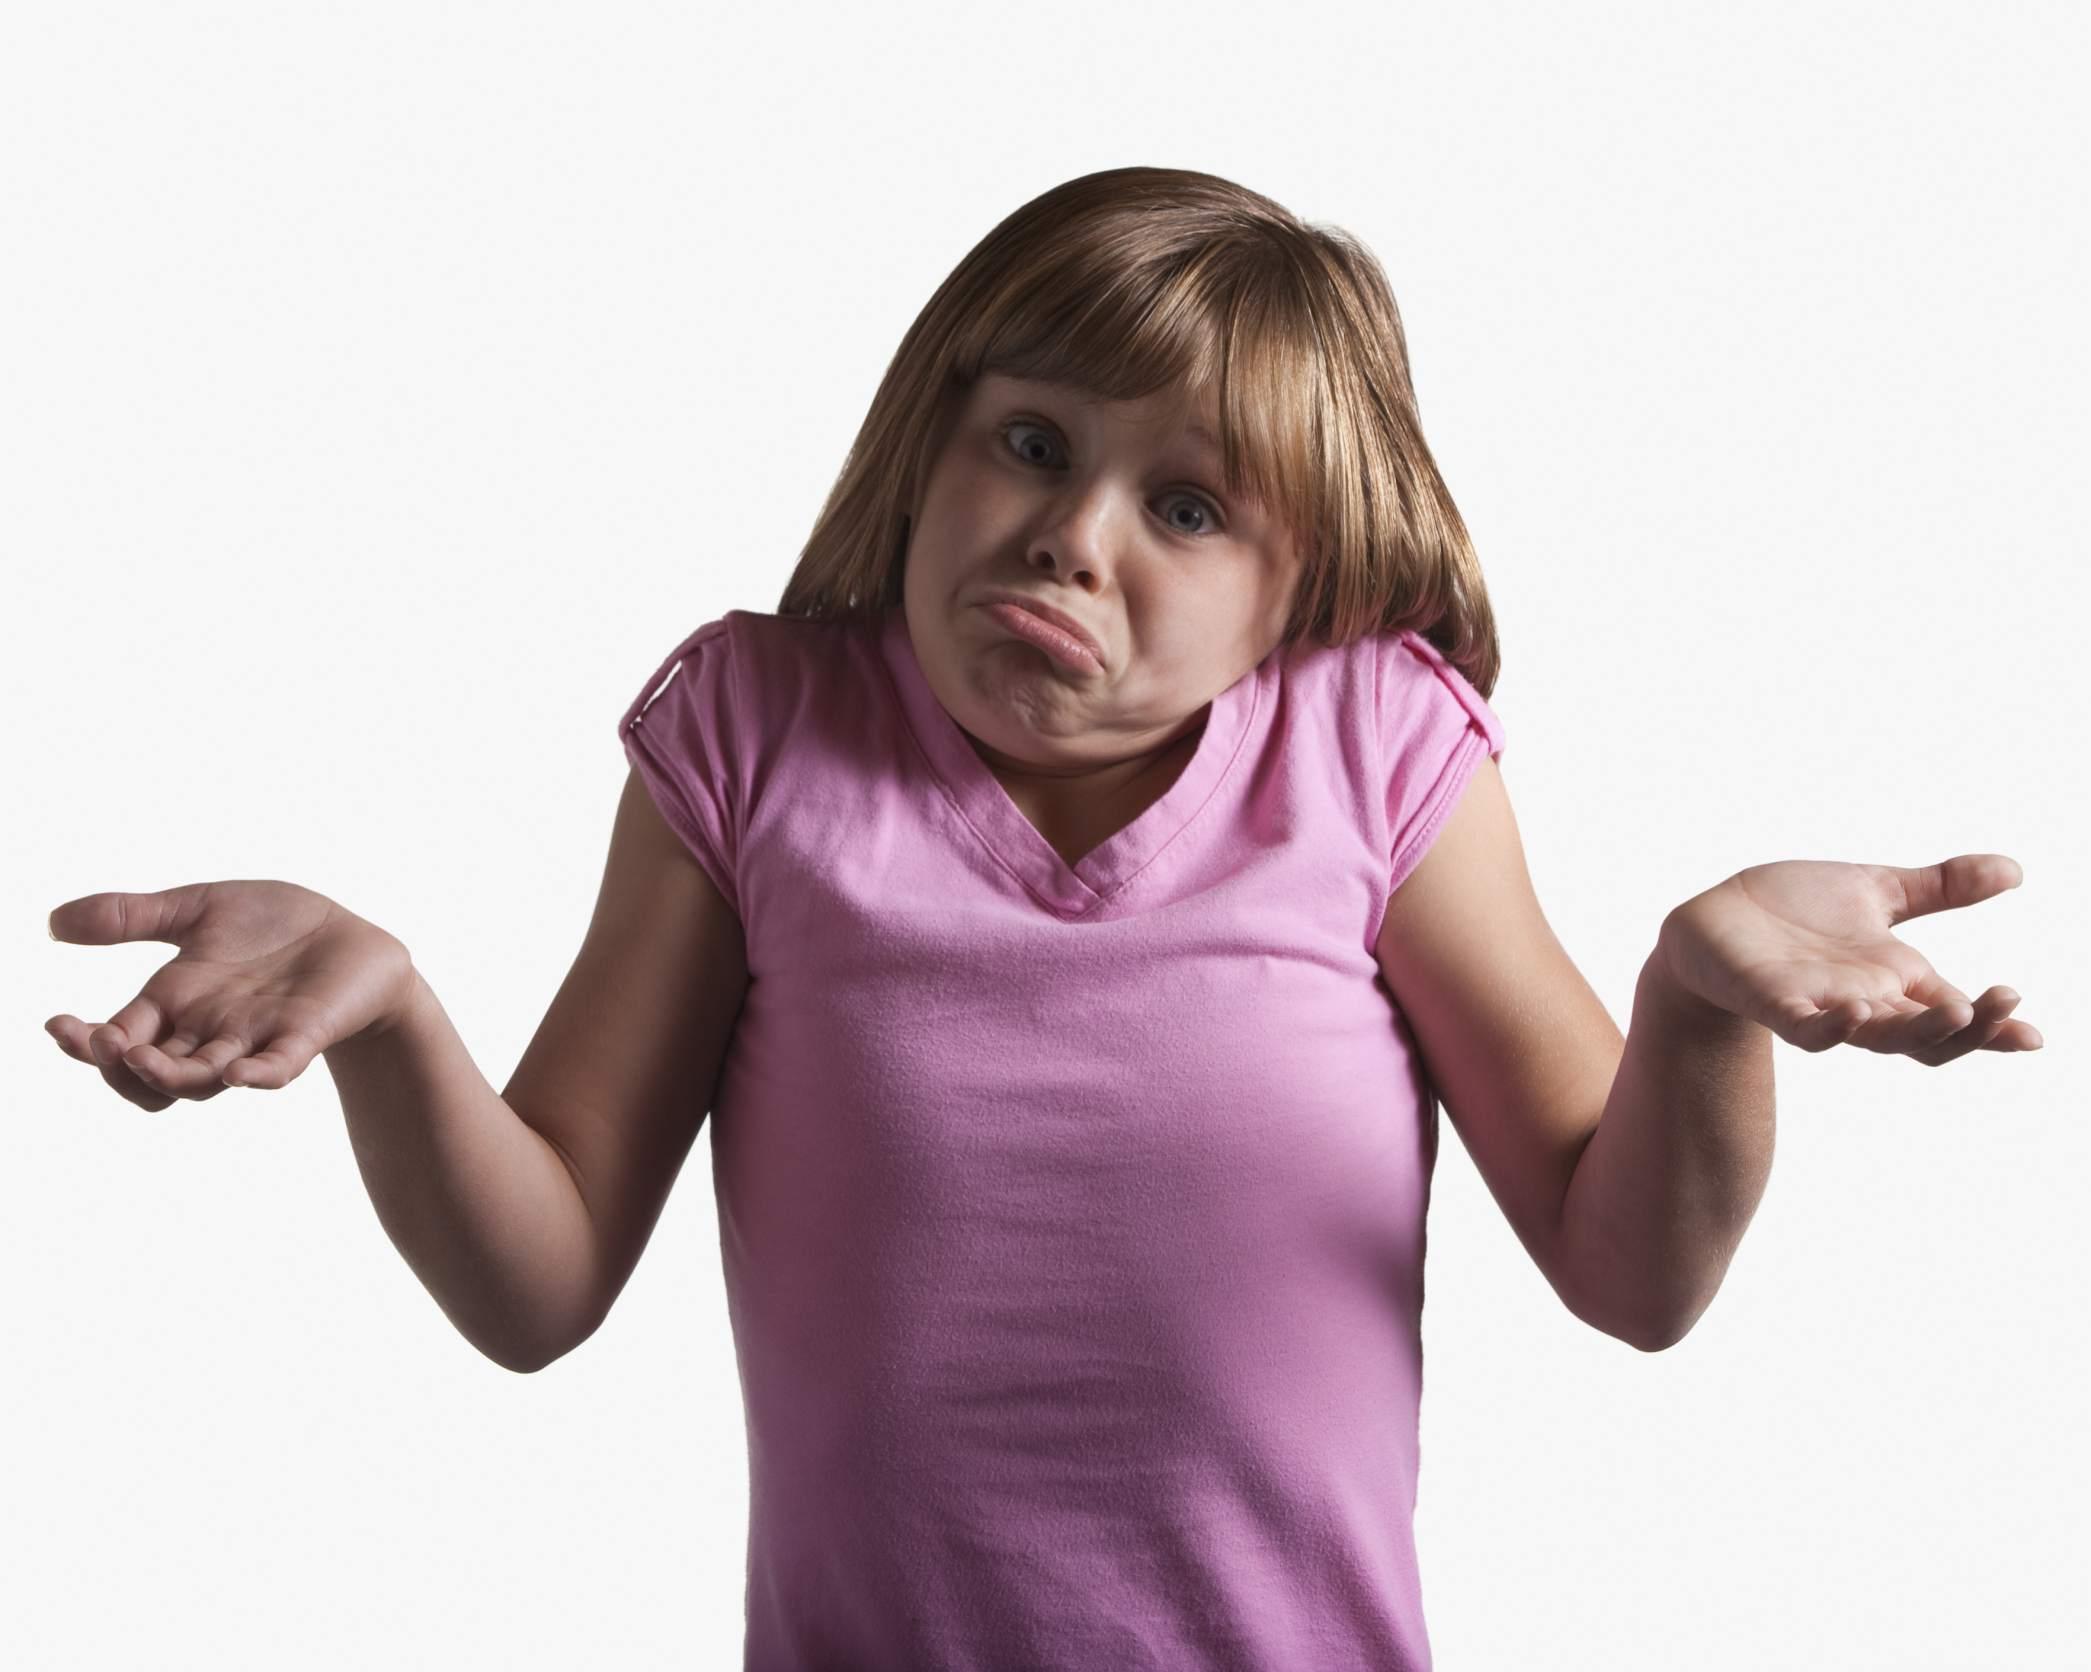 Young girl shrugging